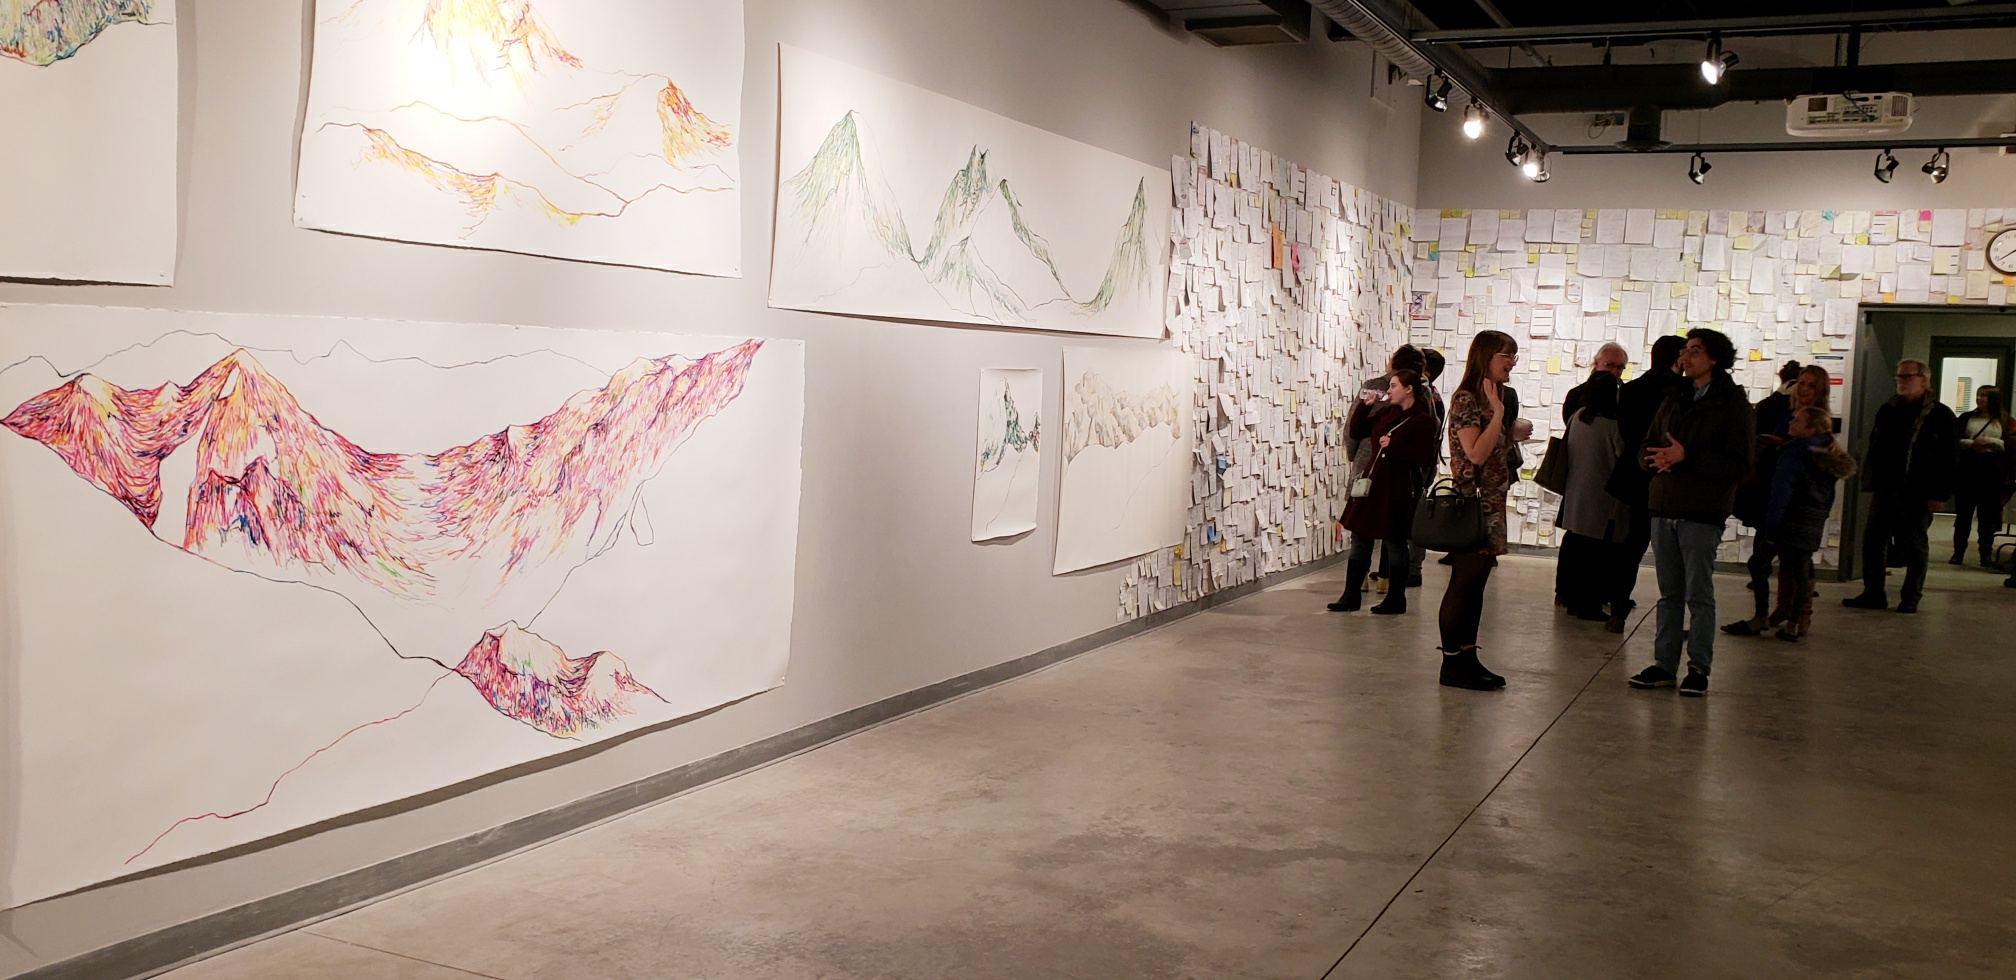 Yorkville Professor Mounts Solo Art Exhibit